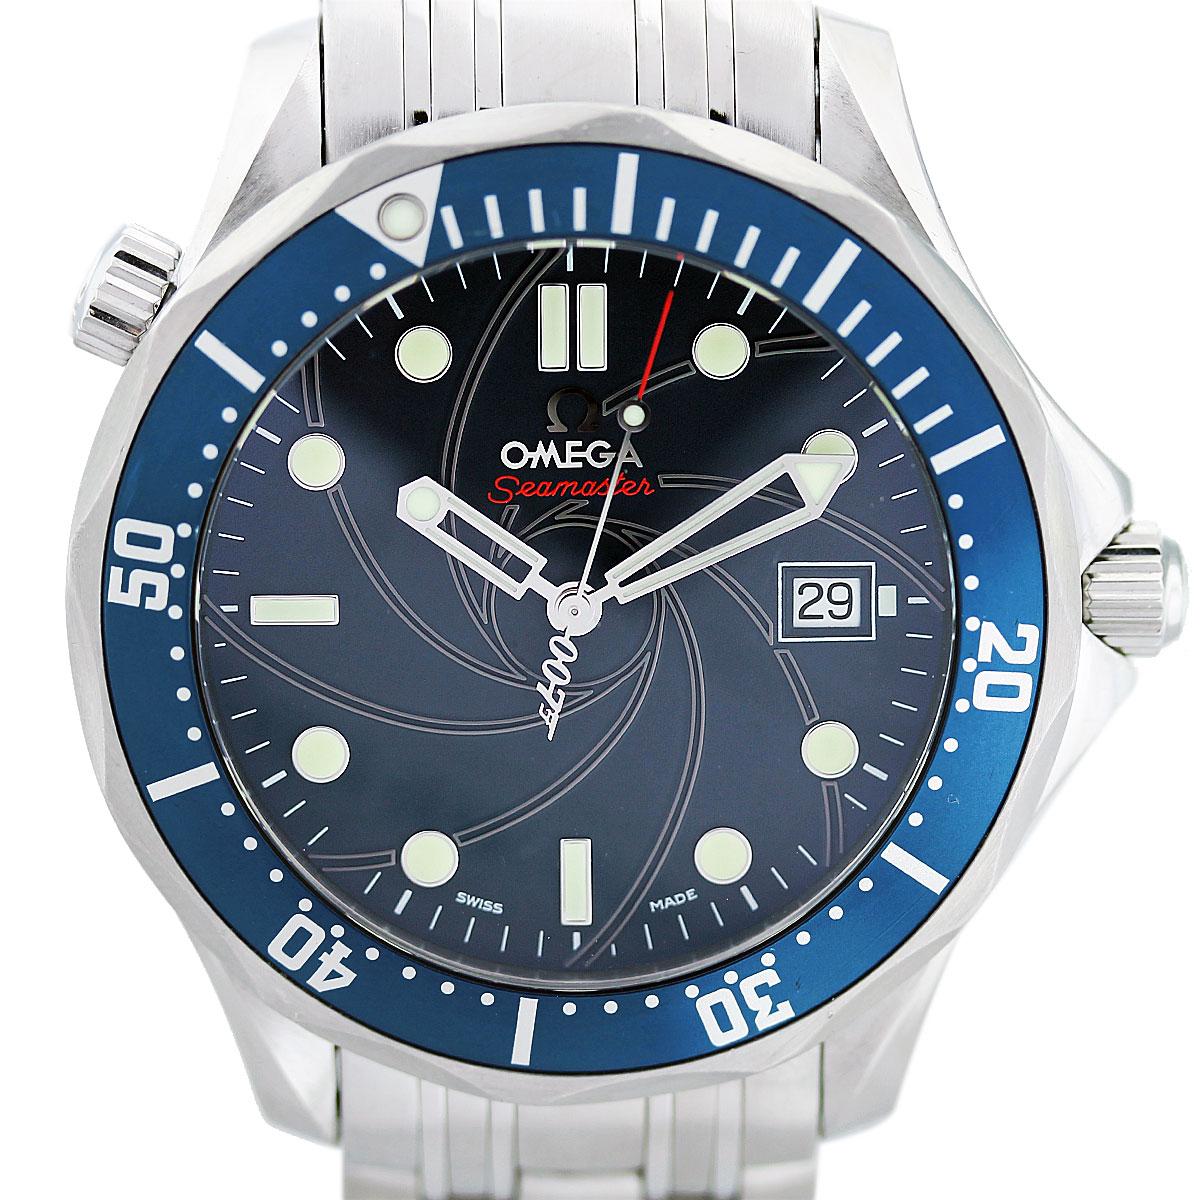 Omega Seamaster James Bond 007 Limited Edition WatchBoca Raton